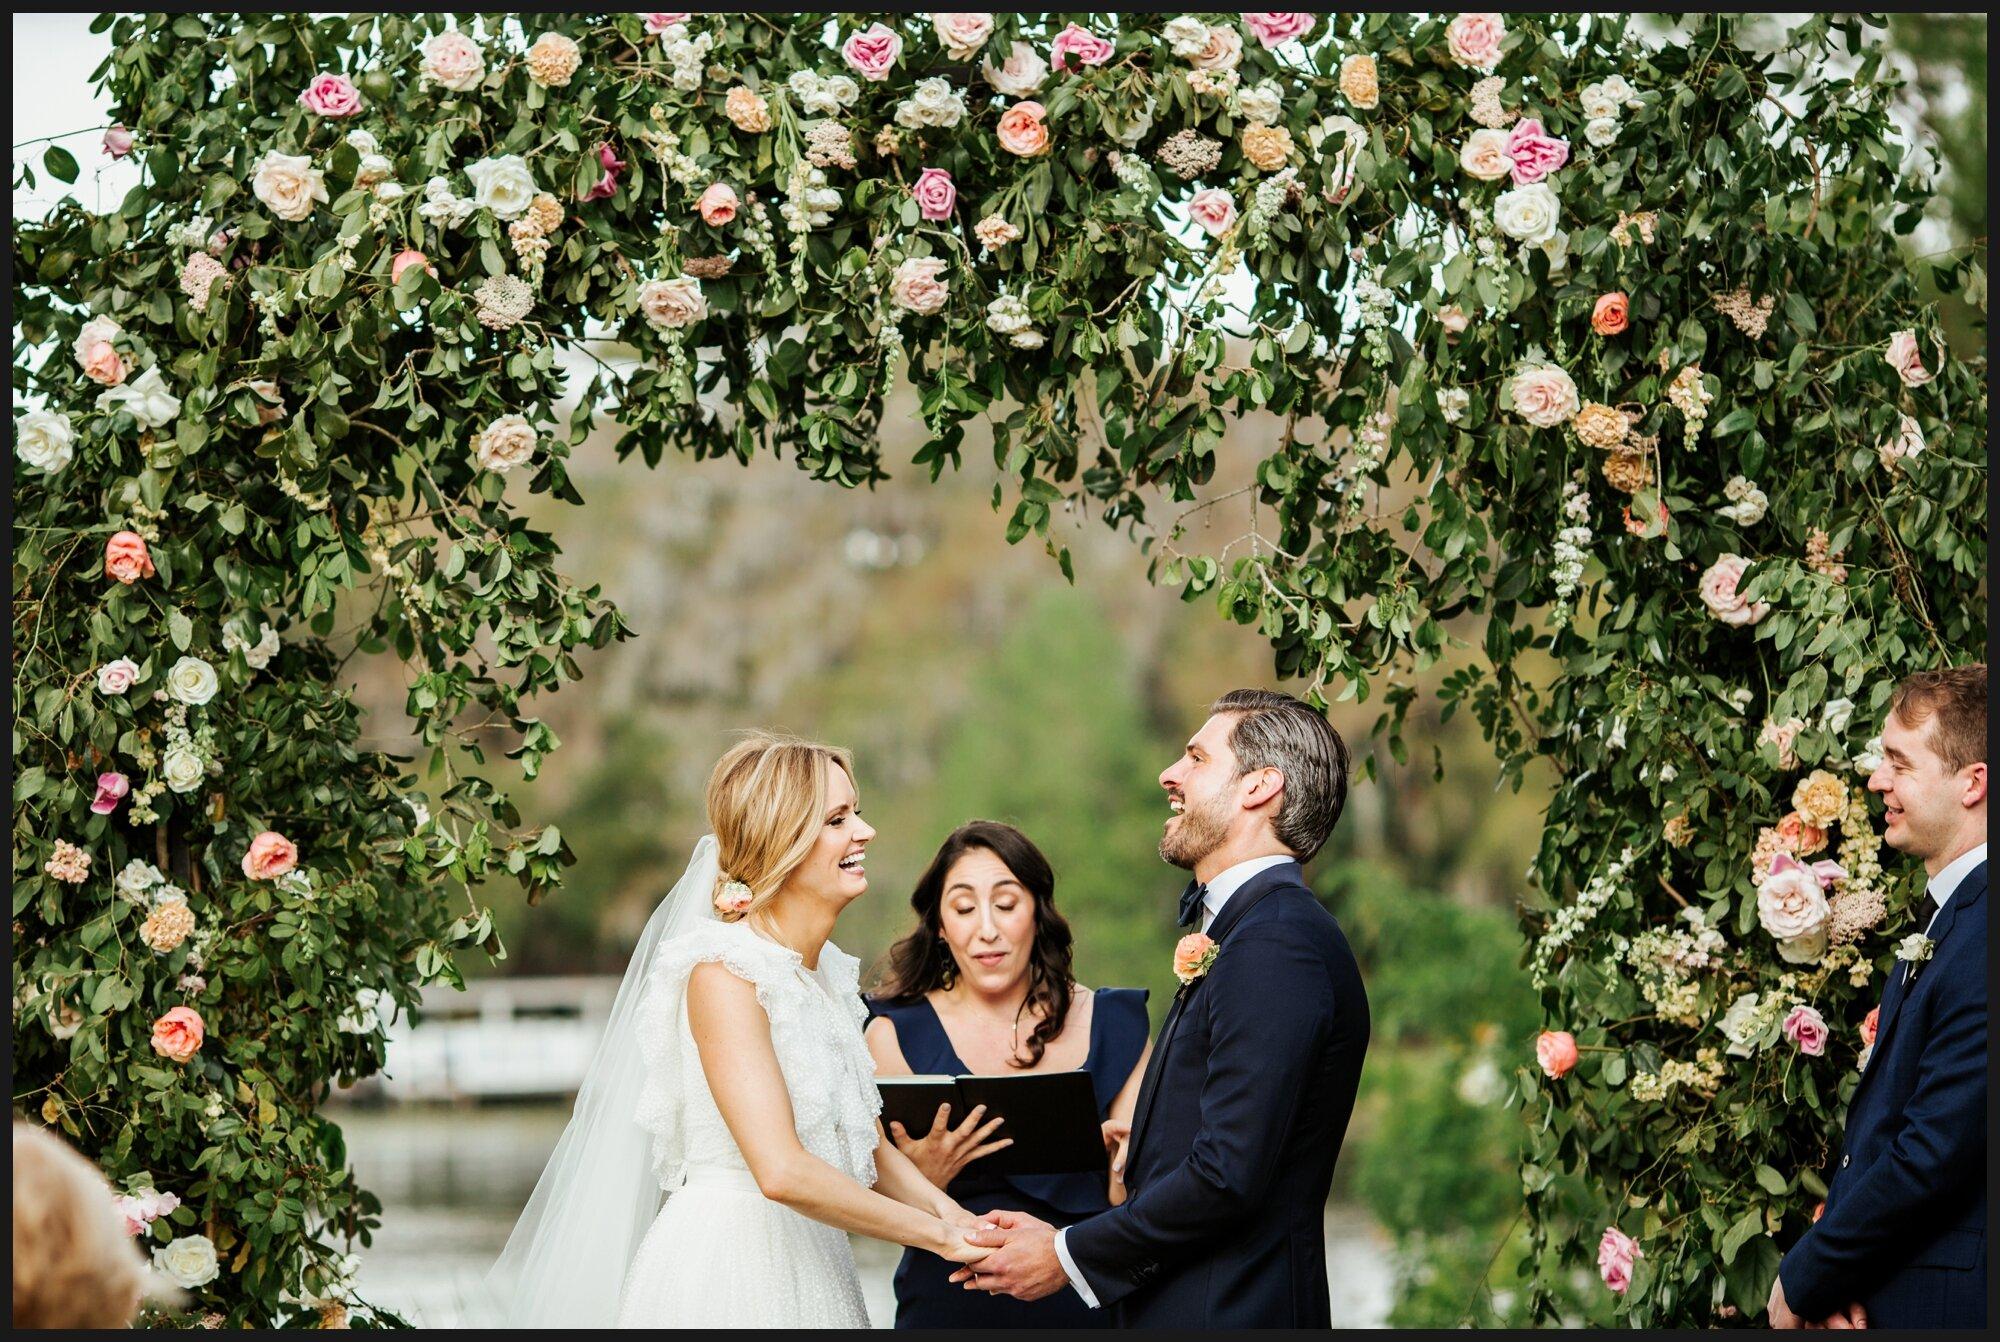 Orlando-Wedding-Photographer-destination-wedding-photographer-florida-wedding-photographer-hawaii-wedding-photographer_0754.jpg